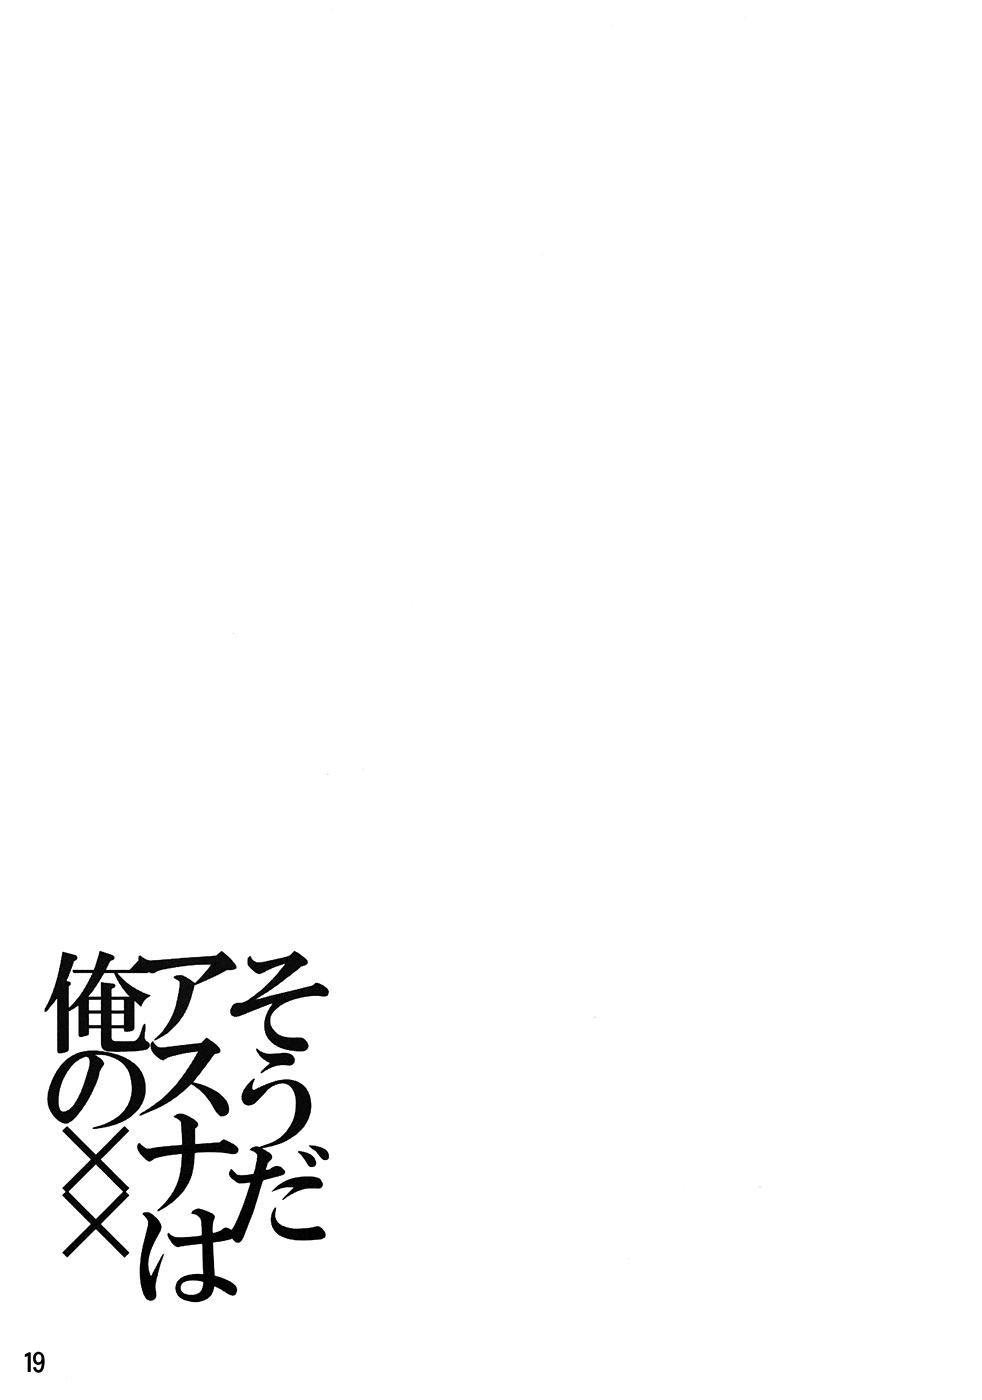 Souda Asuna wa Ore no XX | That's right, Asuna is my XX 17